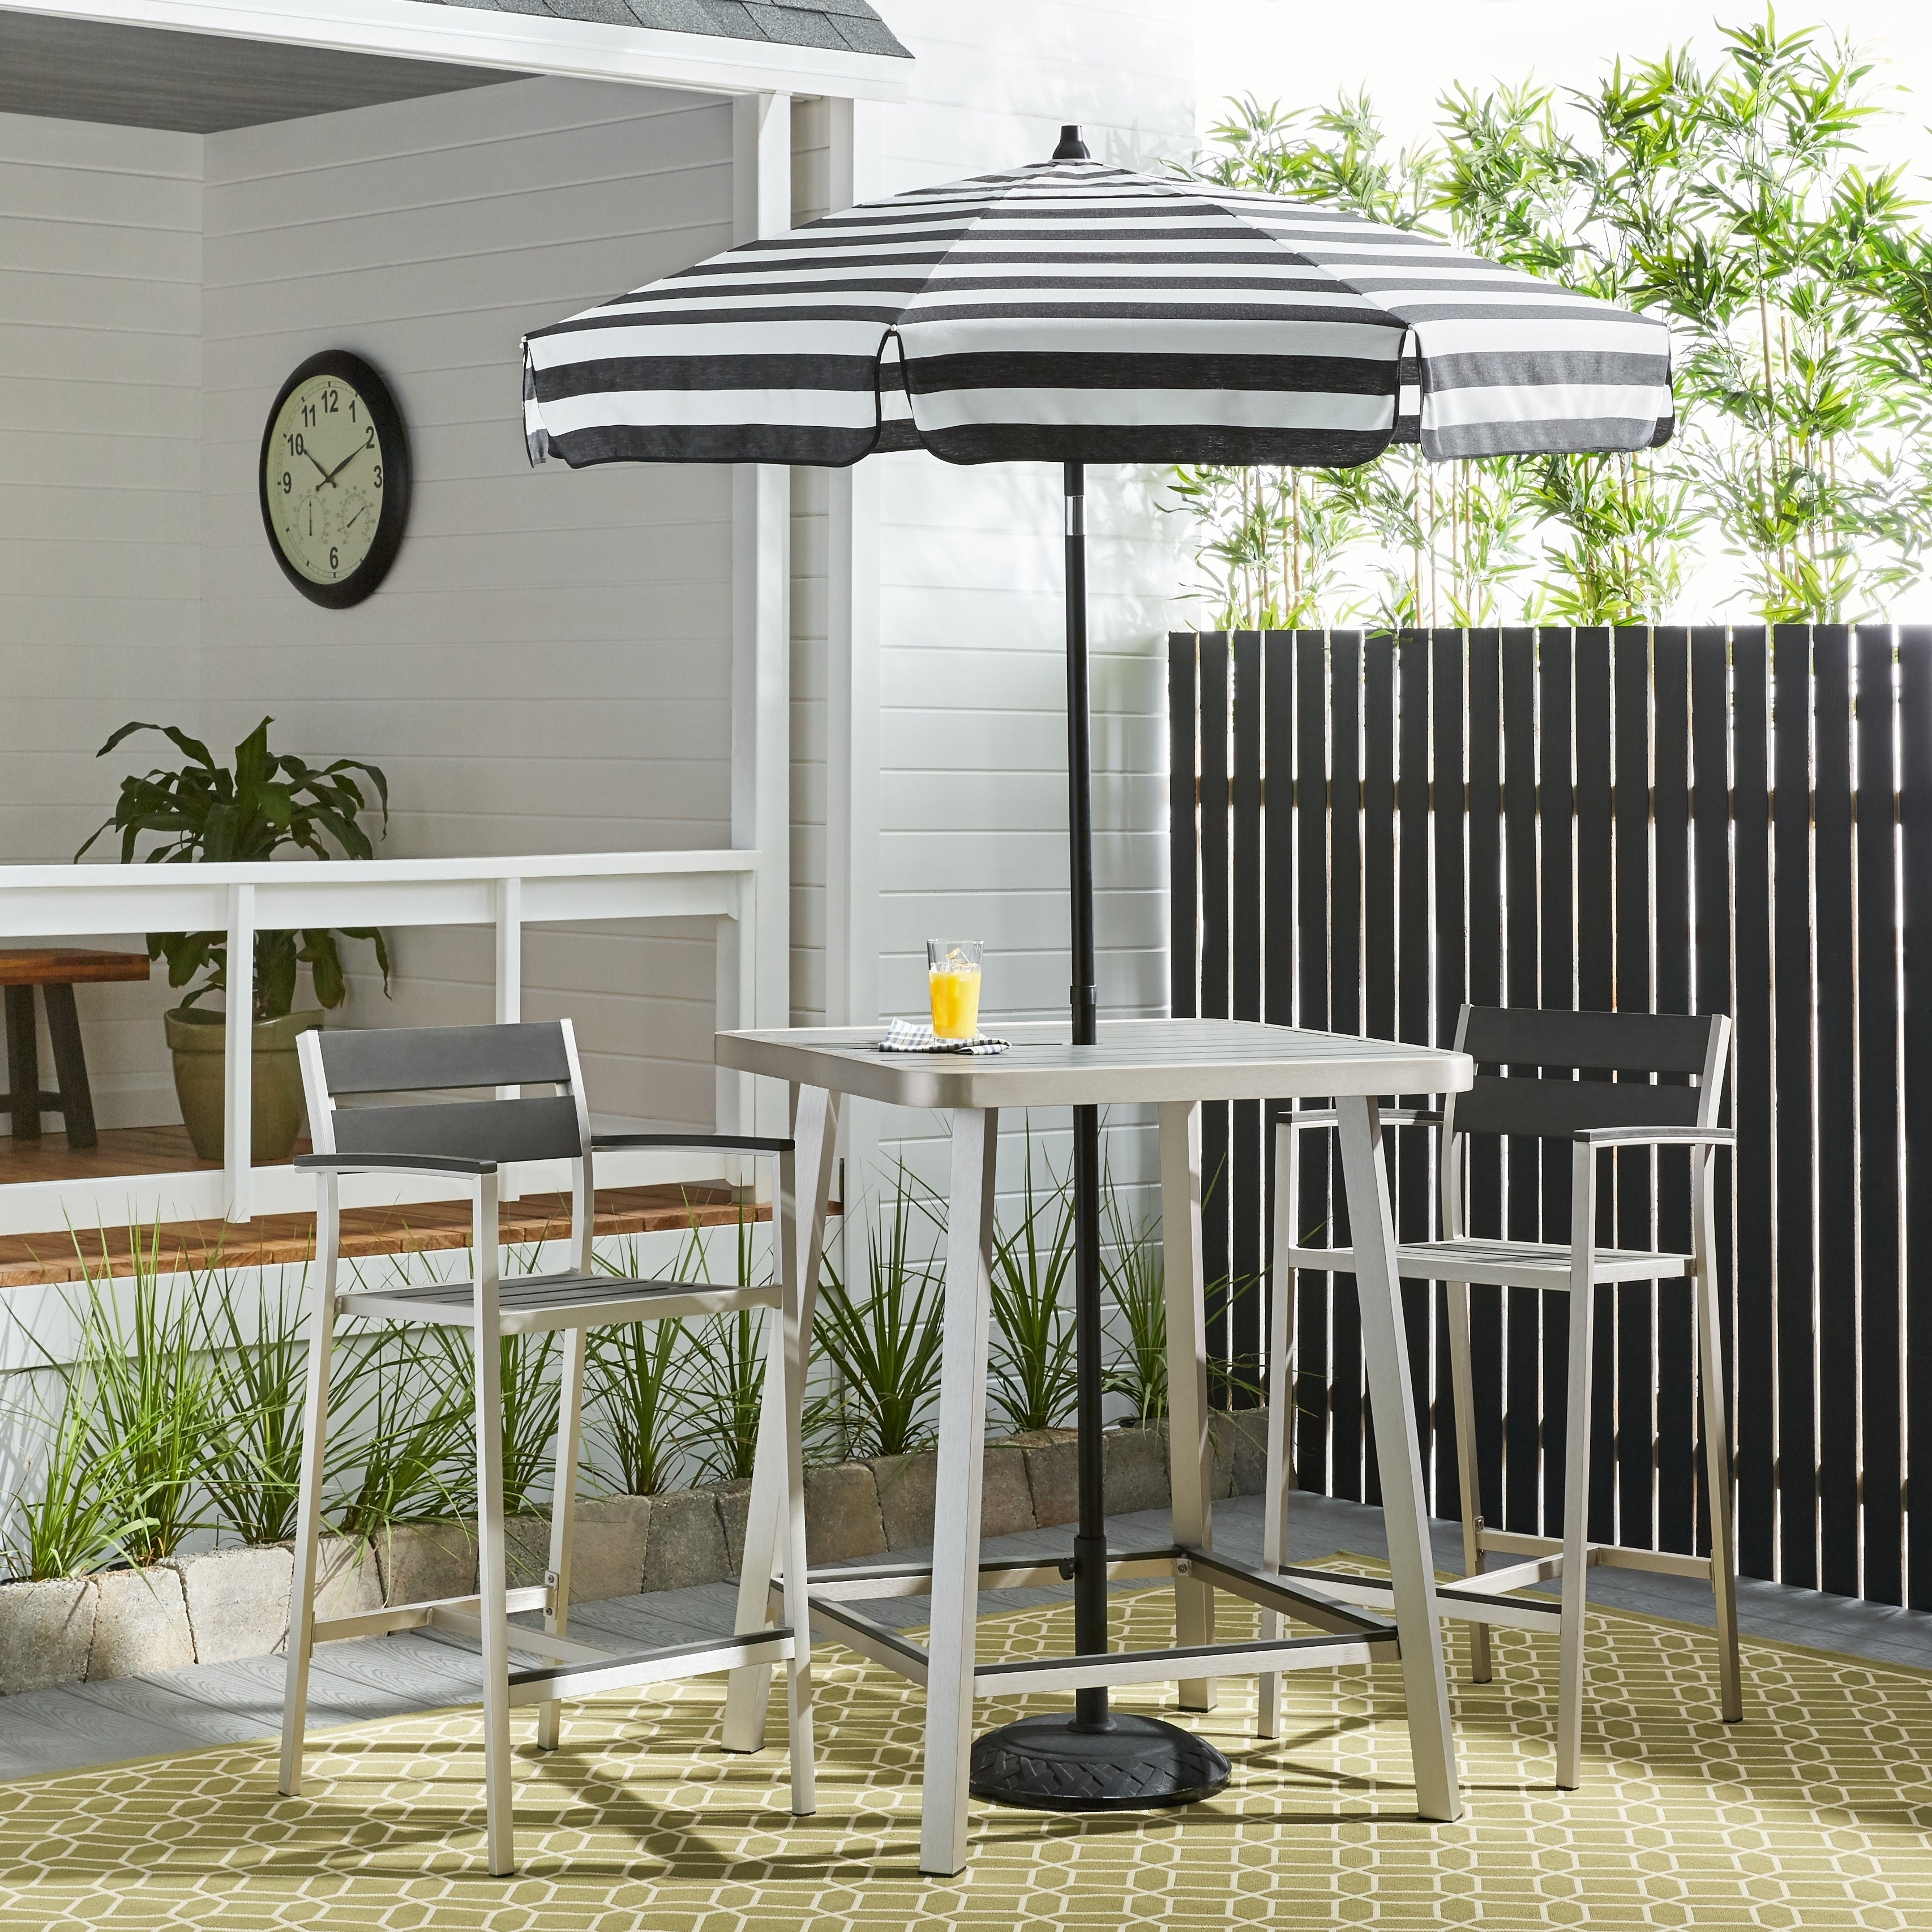 Italian Bistro Acrylic 6 Foot Striped Patio Umbrella